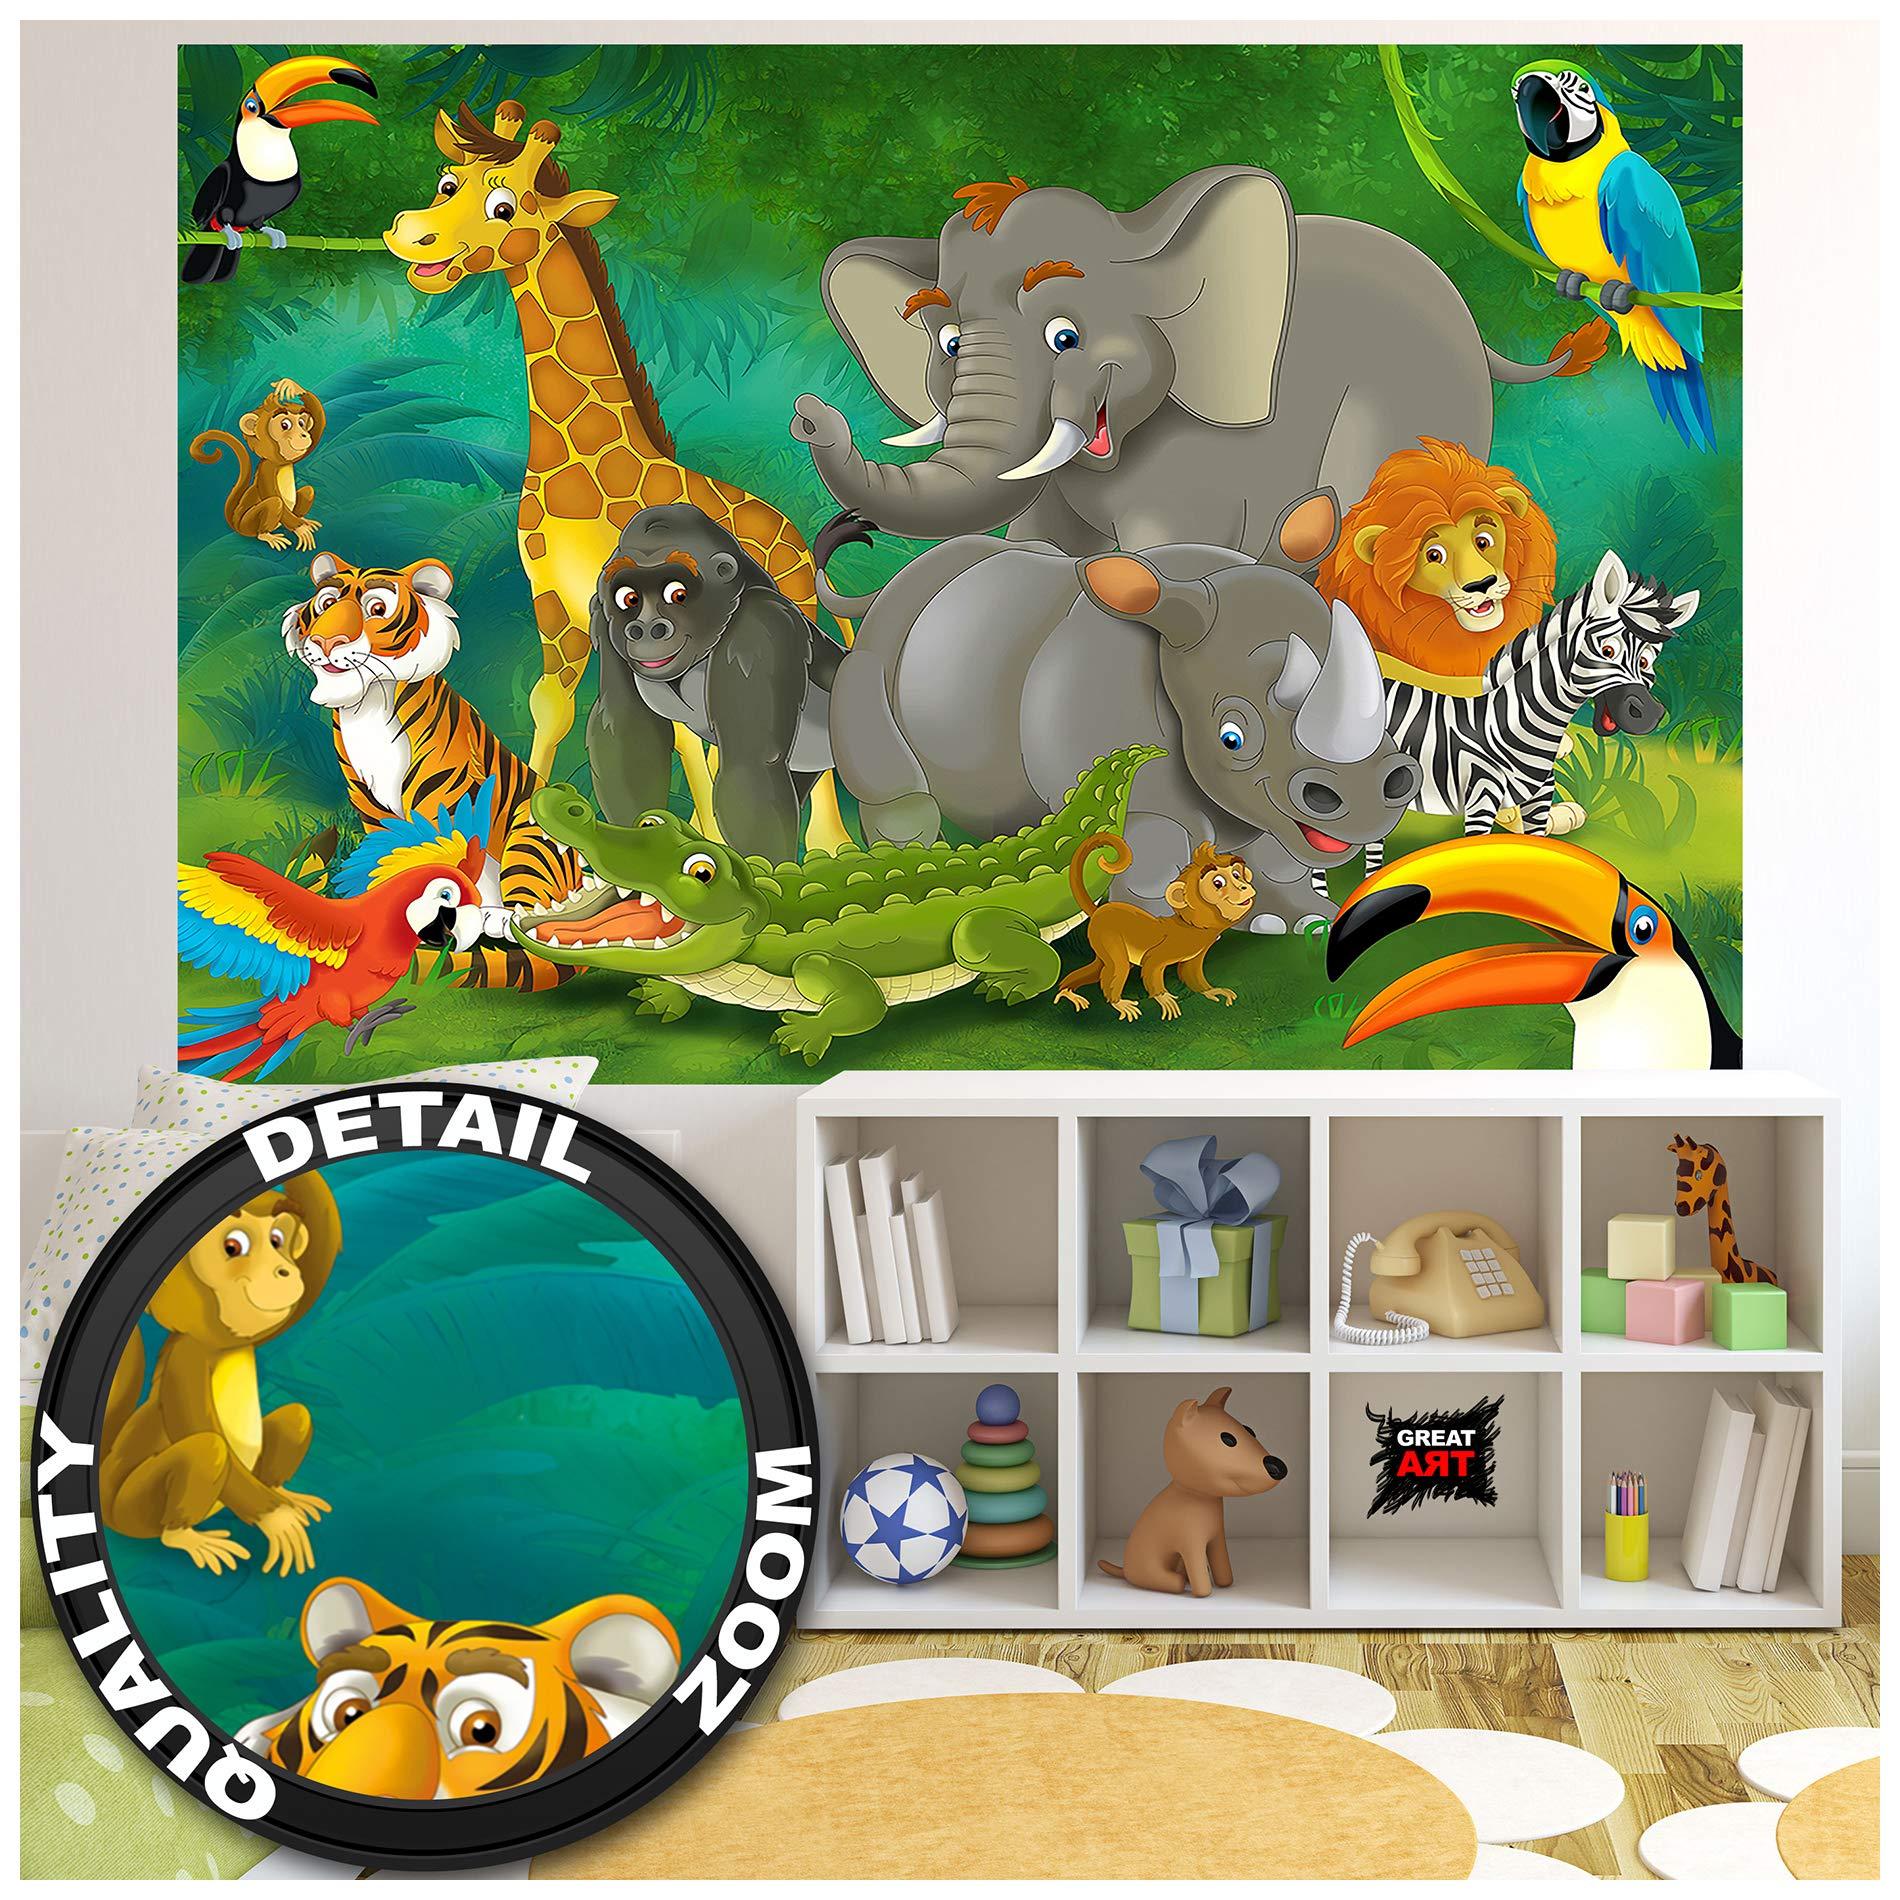 GREAT ART Kid's Room Nursery Photo Wallpaper – Jungle Animals – Picture Decoration Zoo Wildlife Rainforest Nature Safari Adventure Lion Image Decor Wall Mural (82.7x55.1in - 210x140cm)